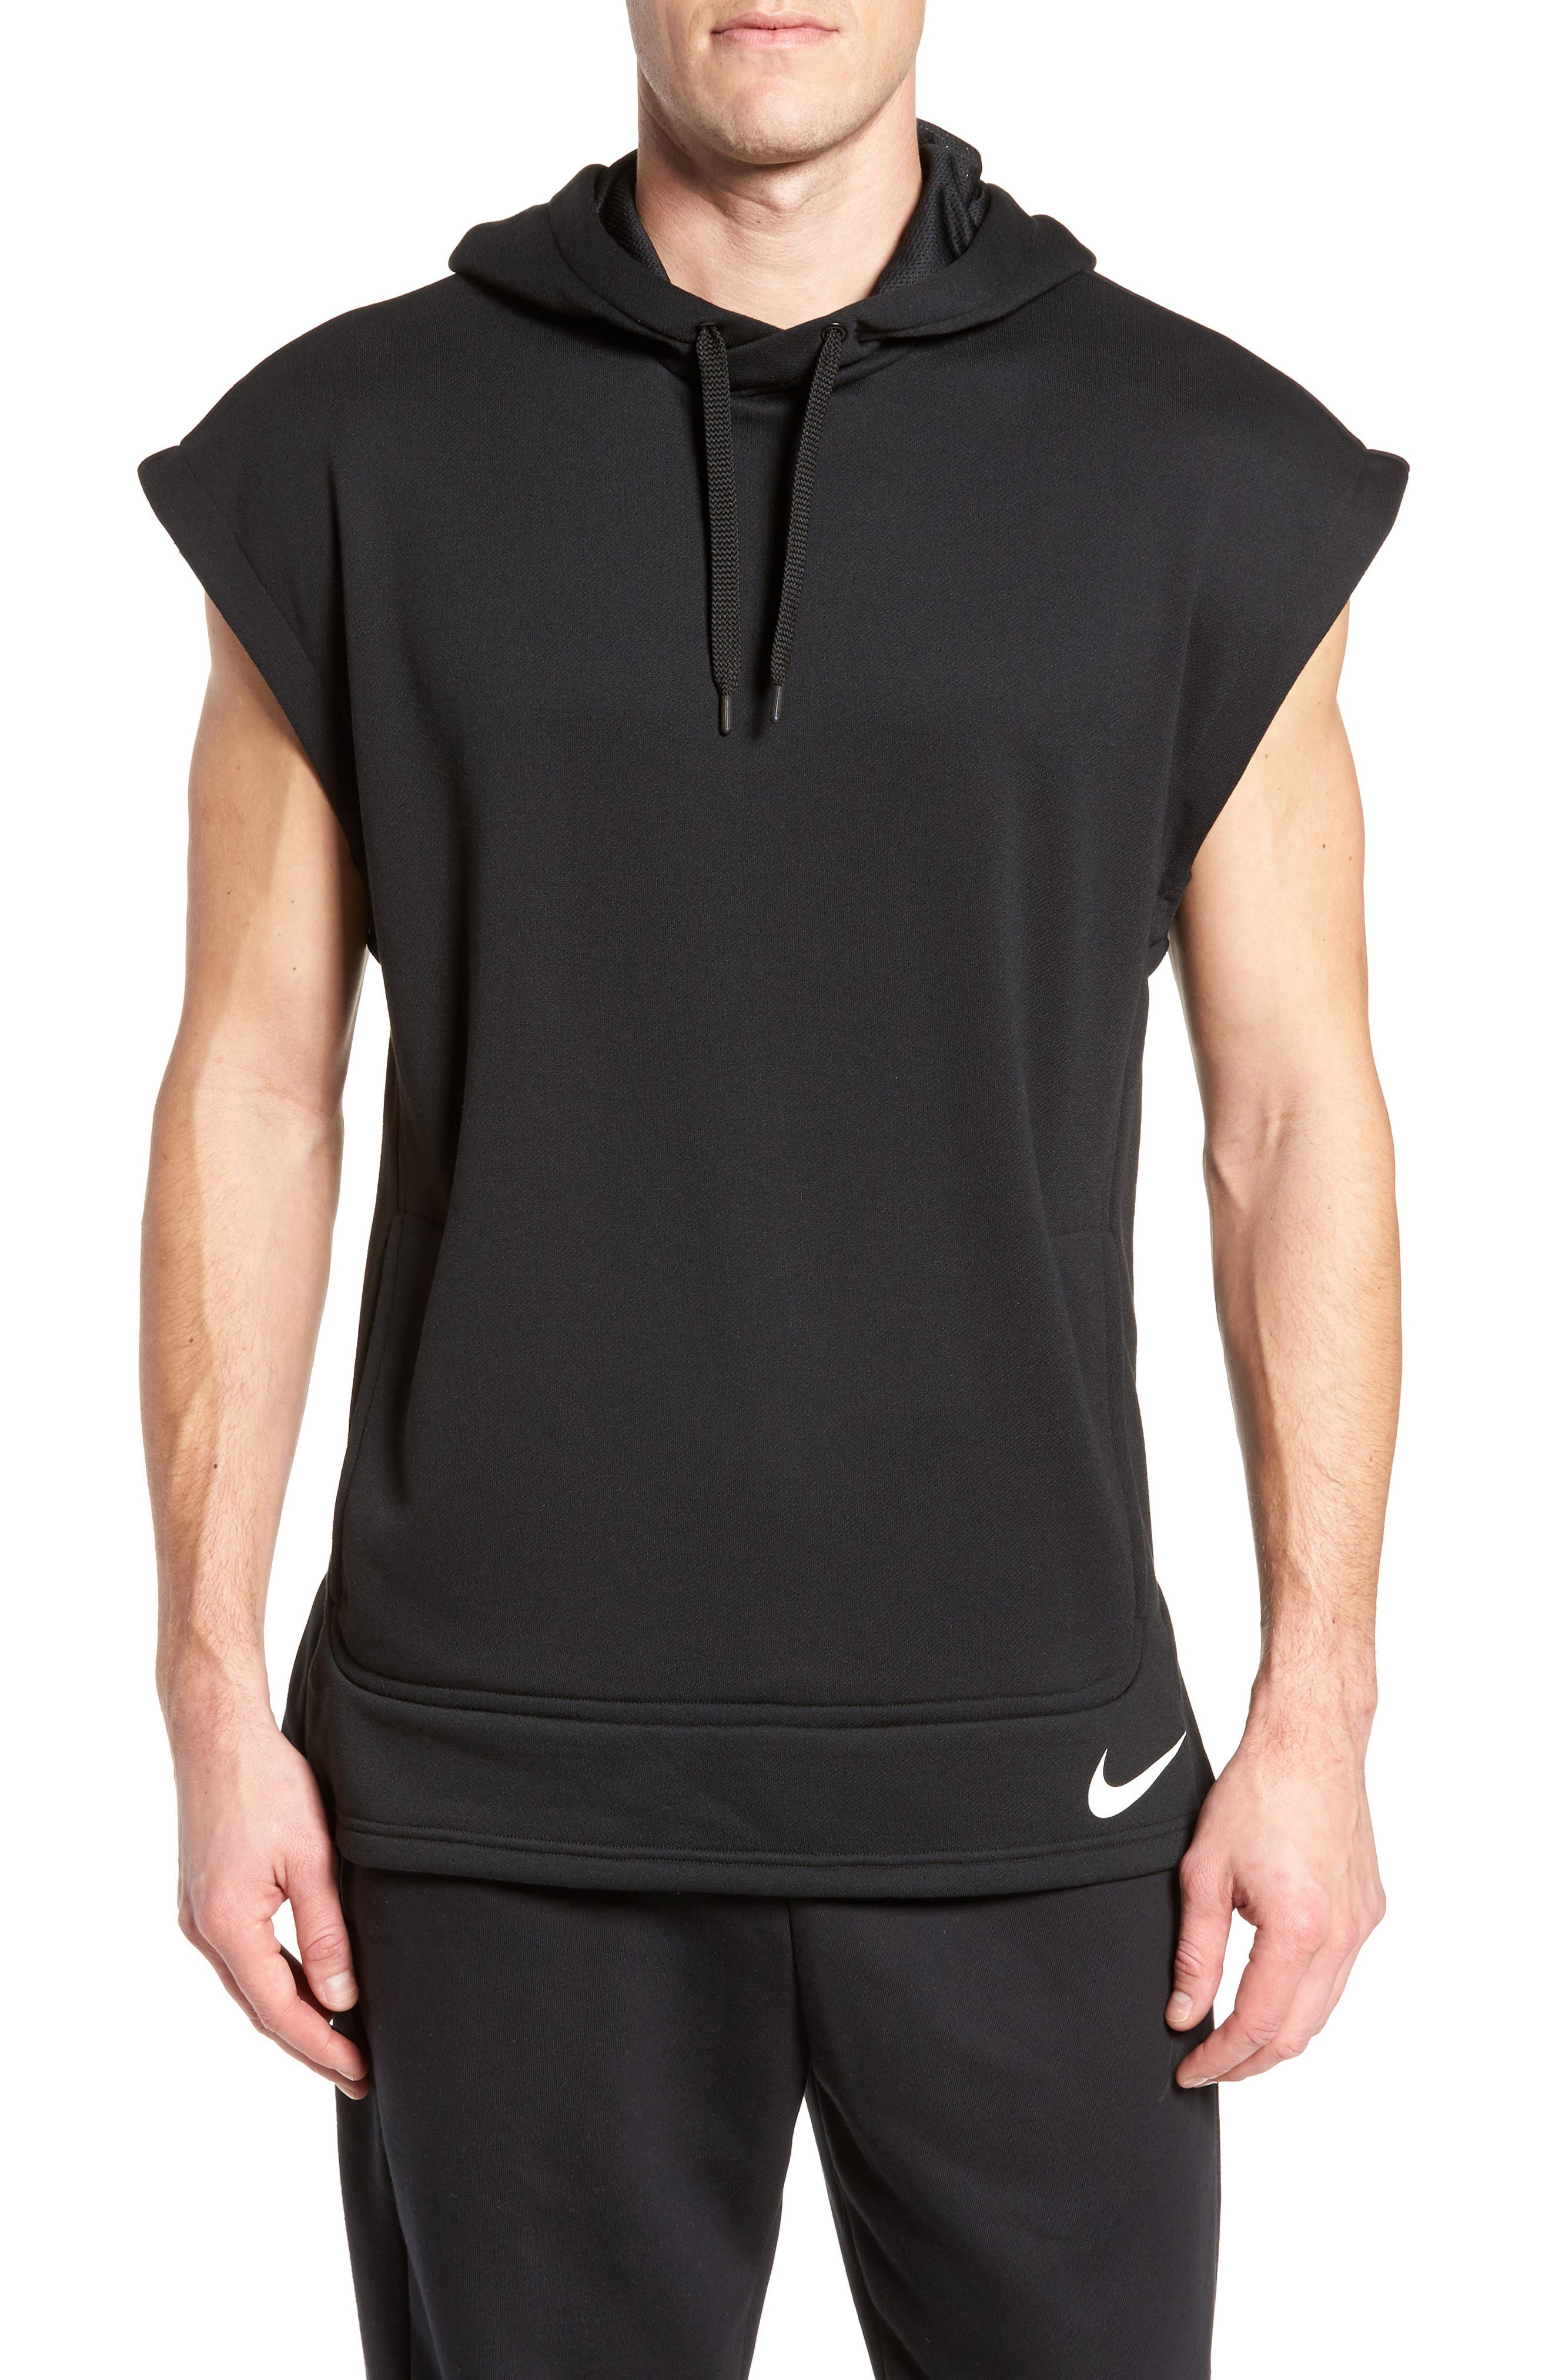 Training Dry Top PX Sleeveless Hoodie,                         Main,                         color, Black/ Black/ White